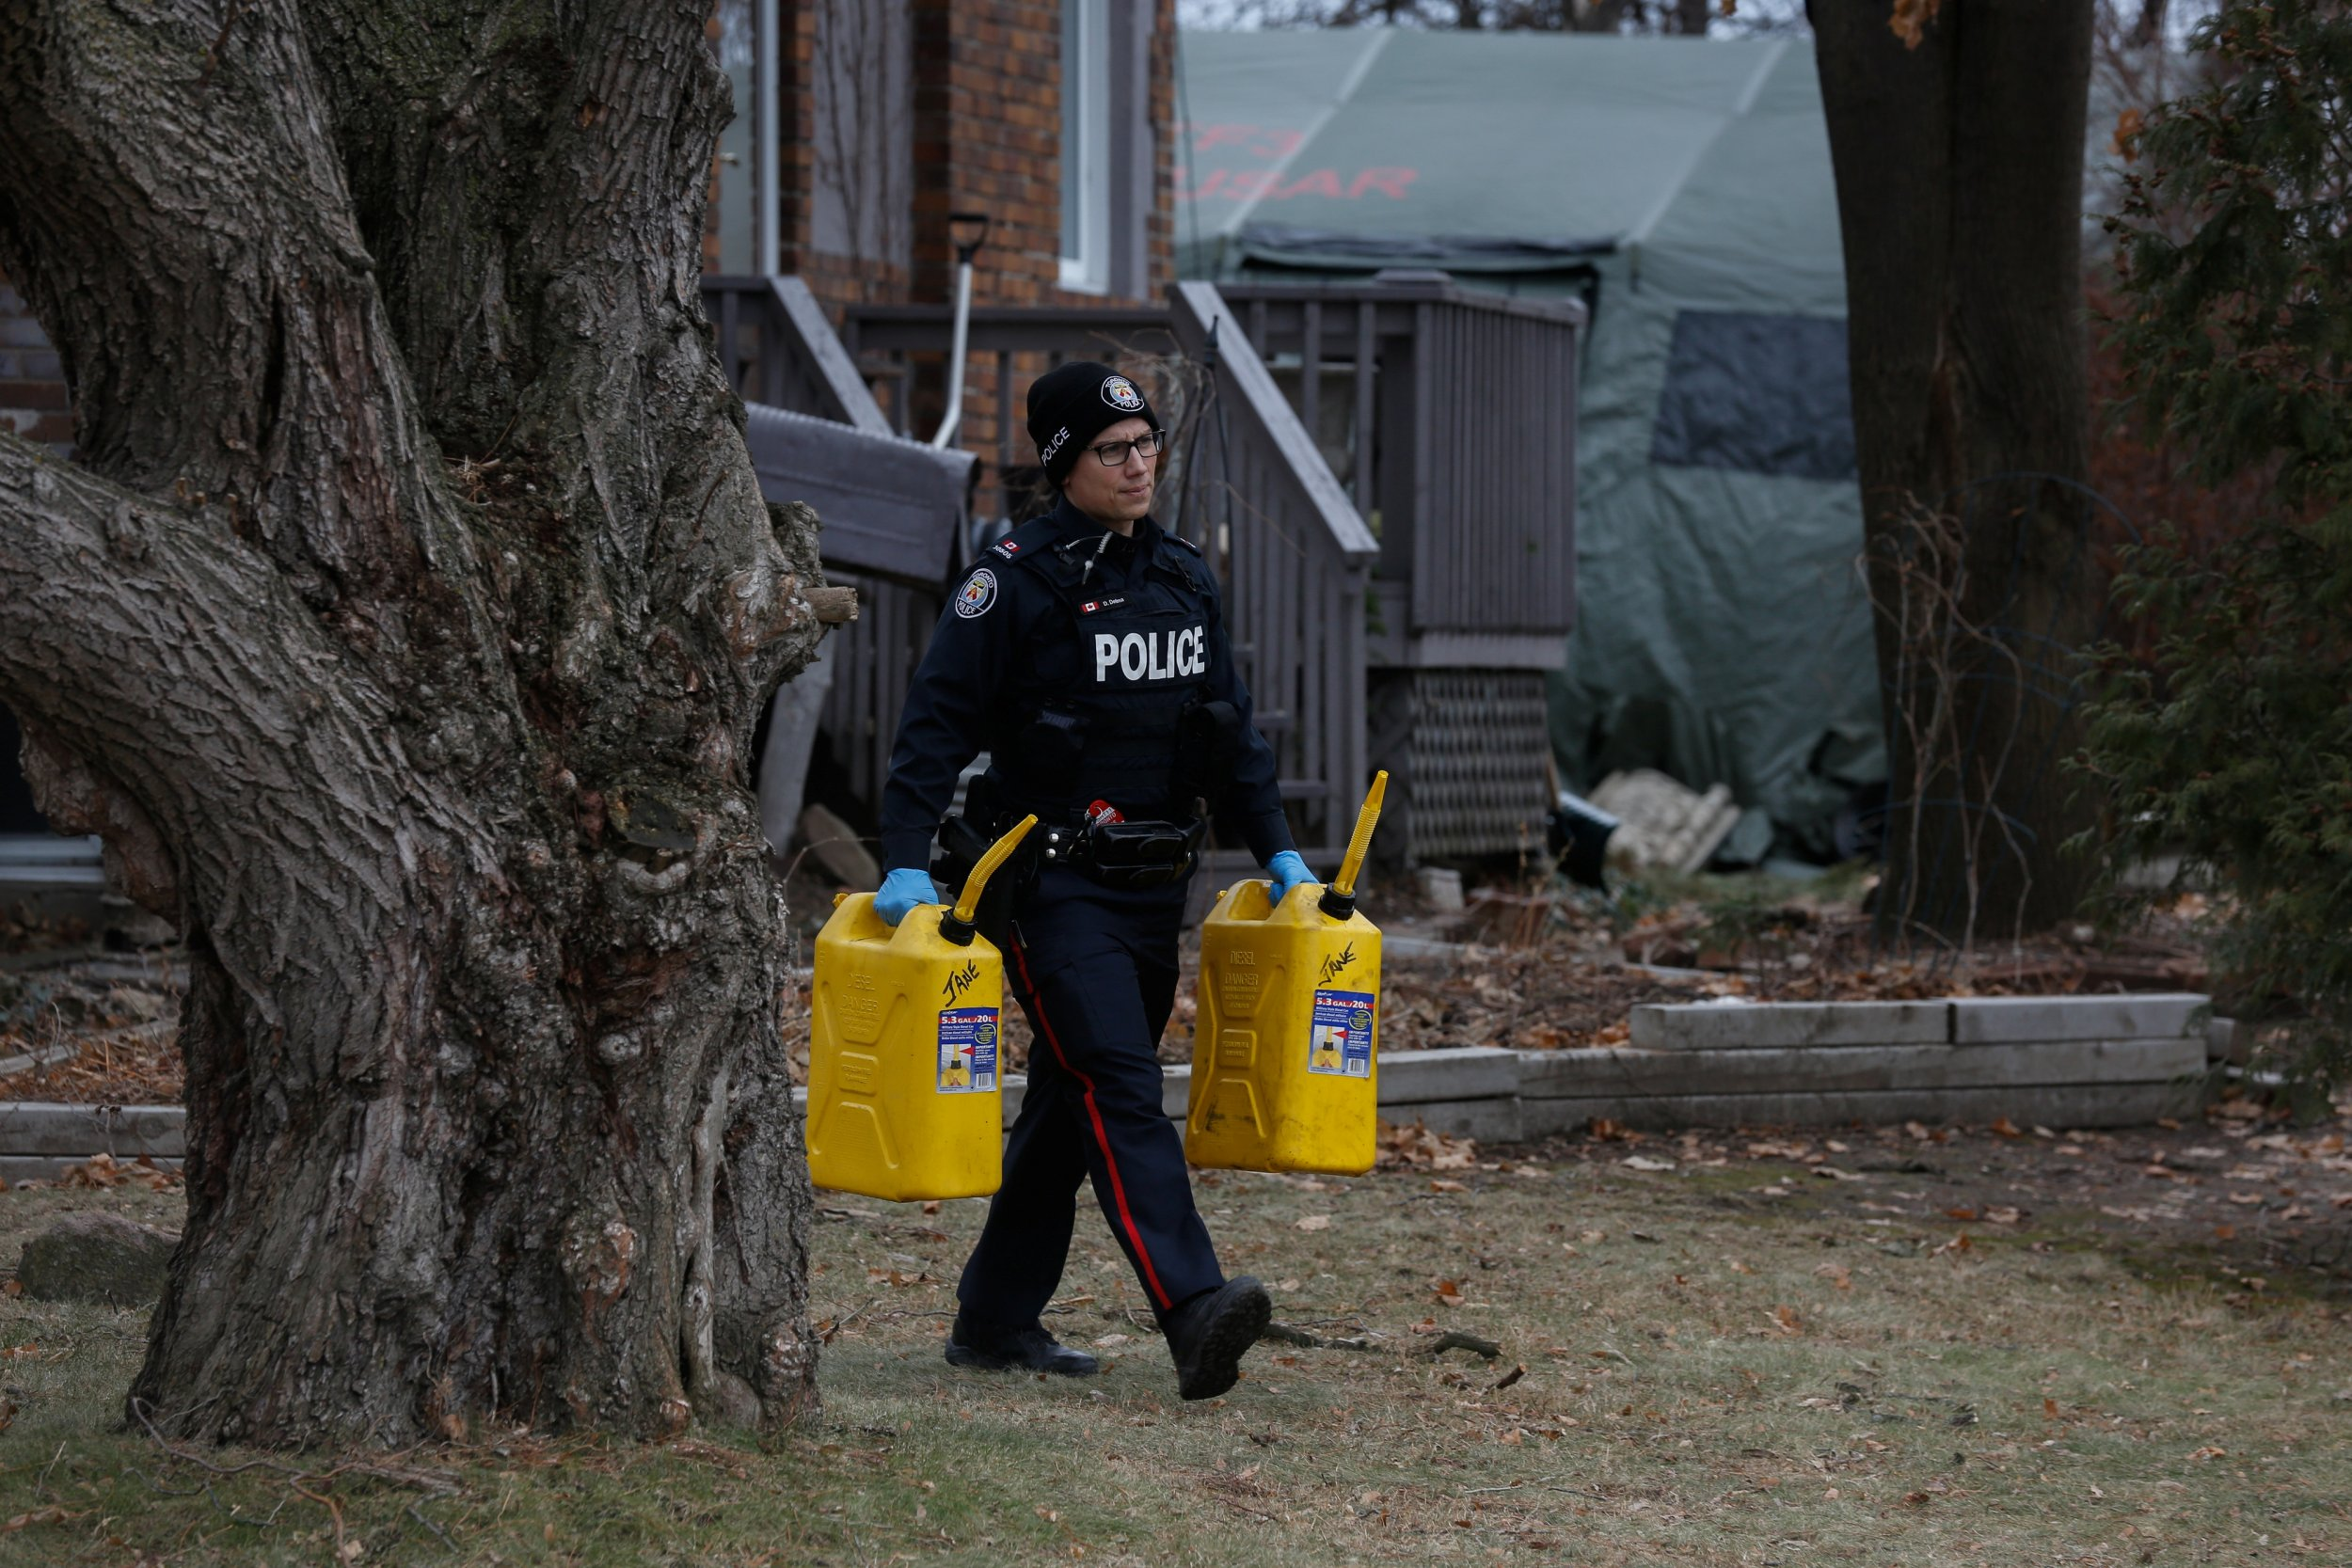 01_30_TorontoPolice